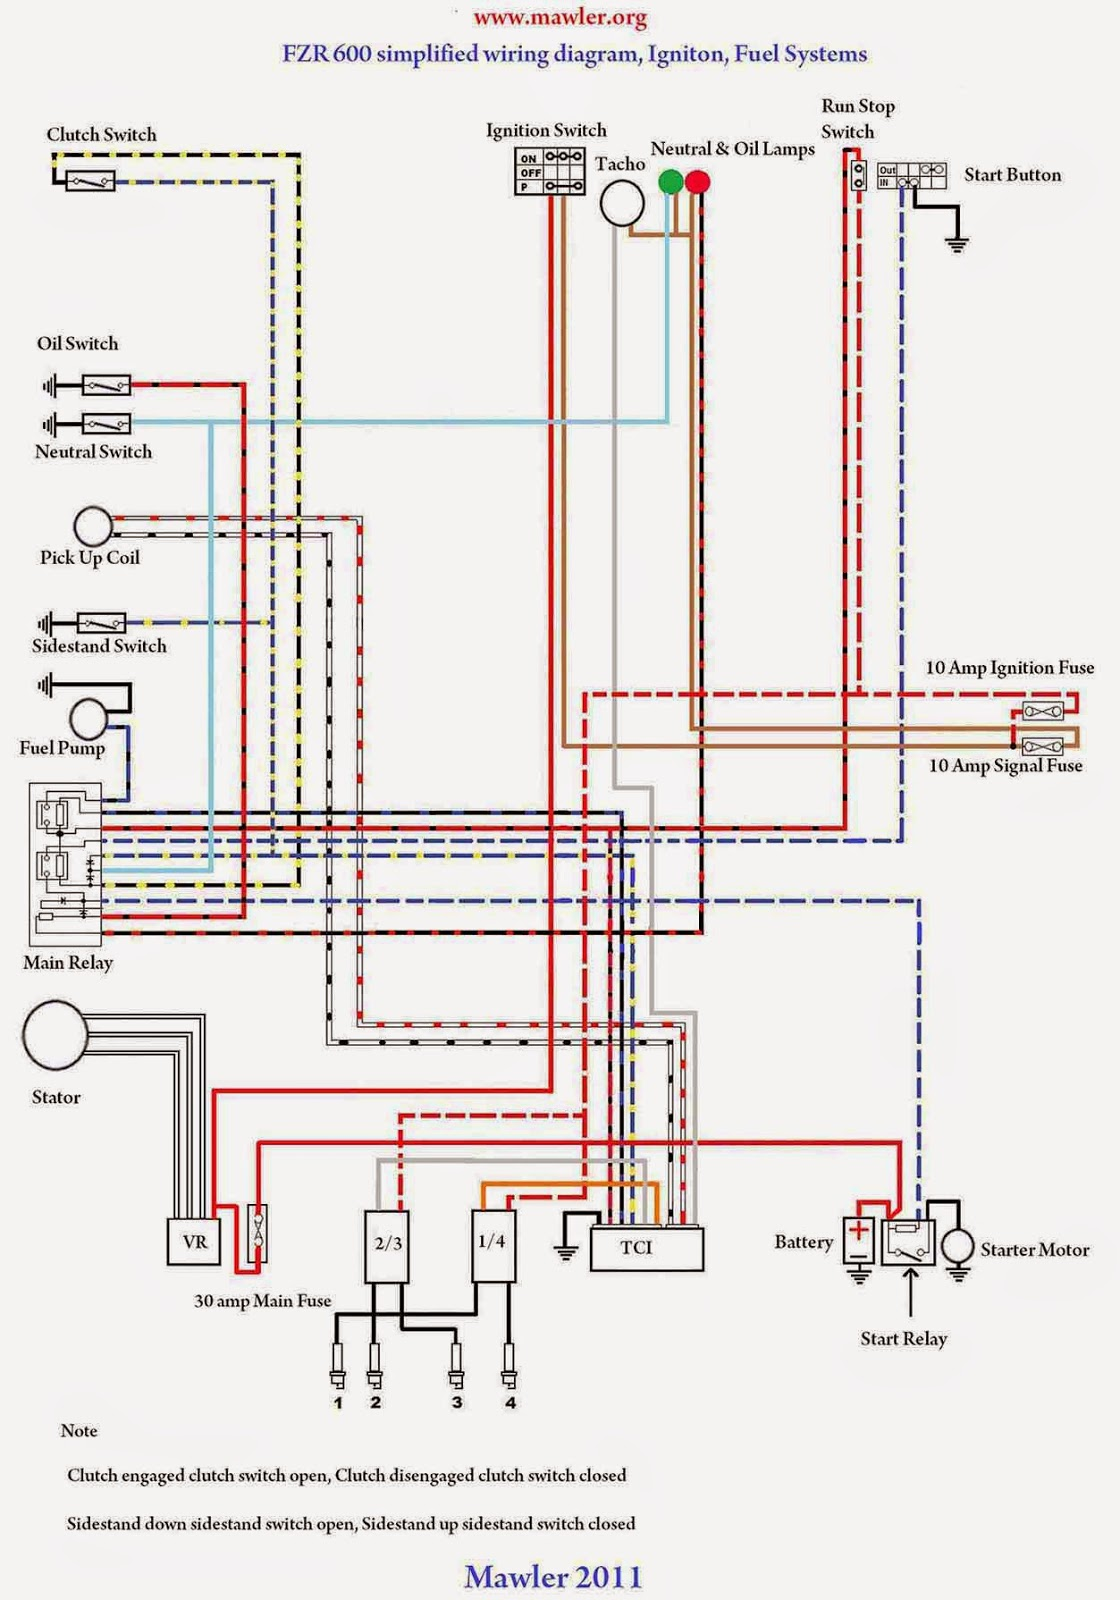 medium resolution of fzs 600 wiring diagram 22 wiring diagram images